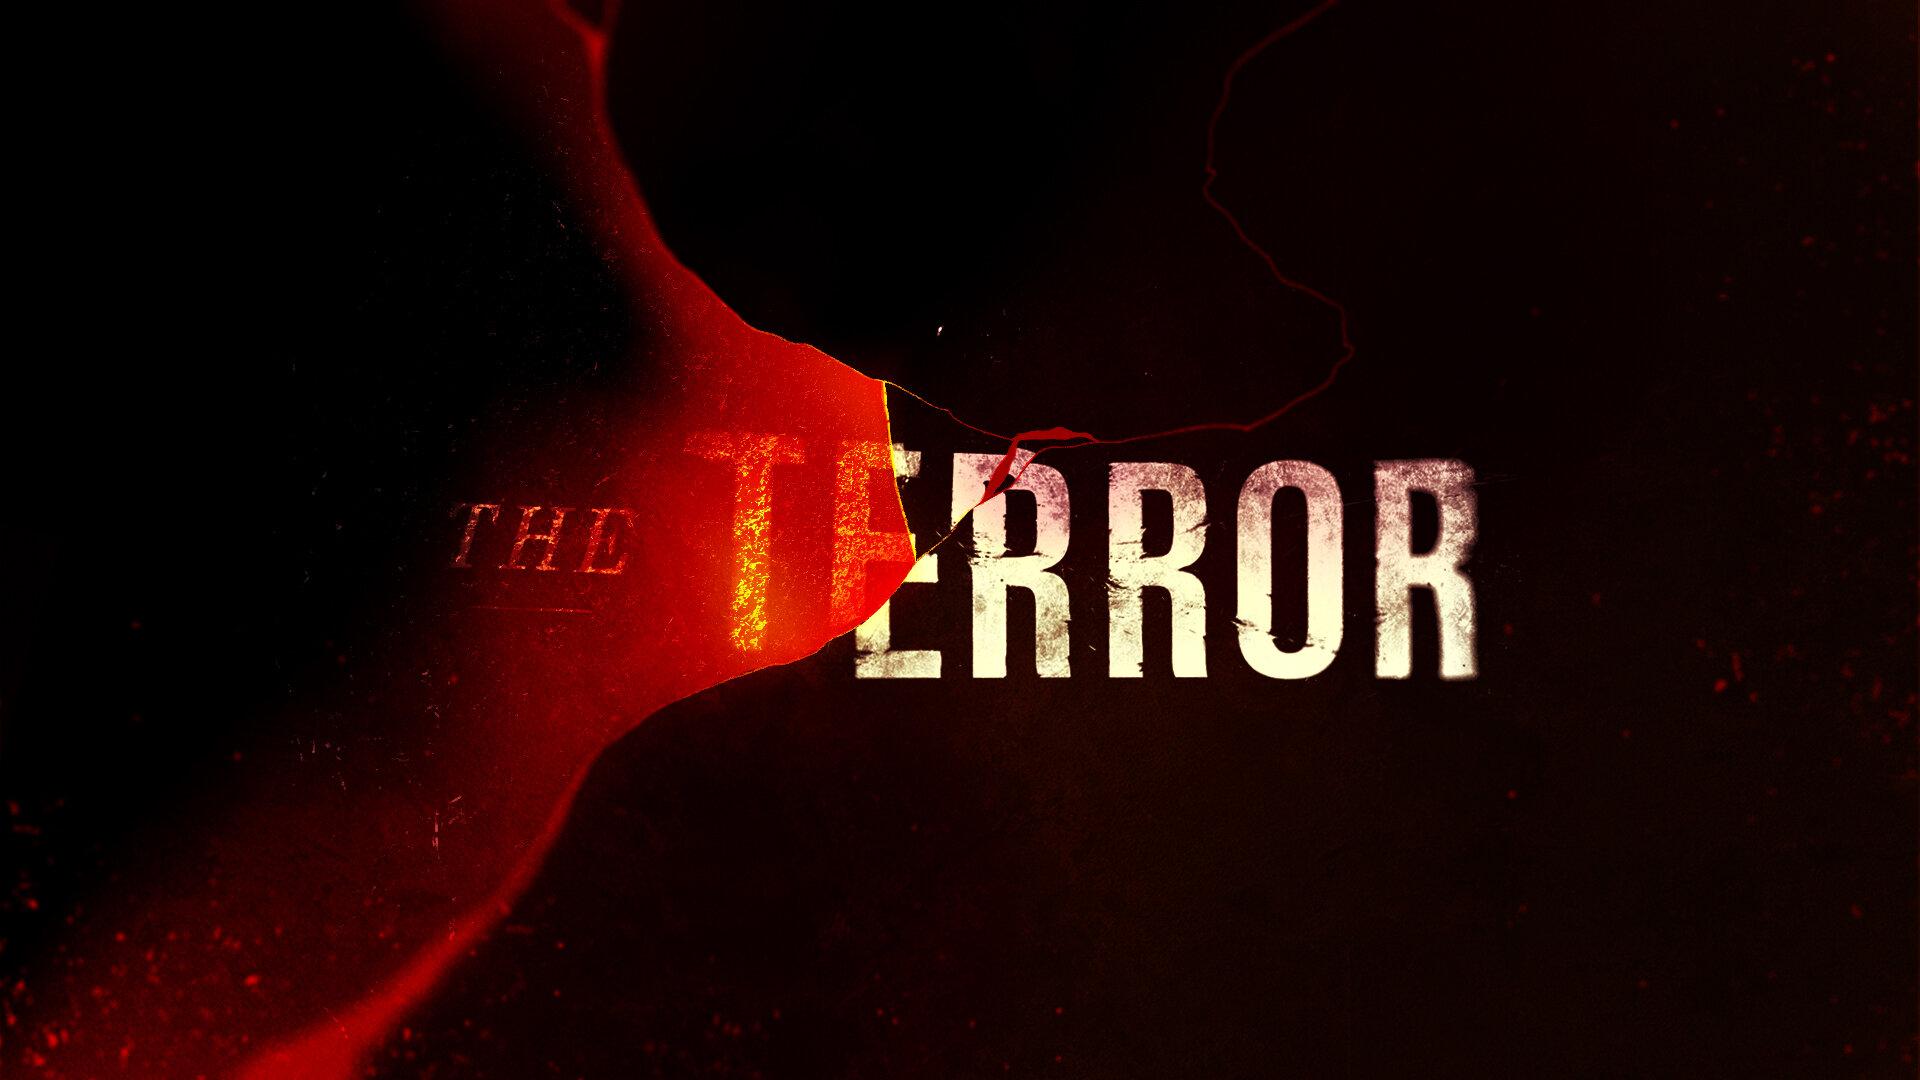 TheTerror_S02_Type_AL_04.jpg